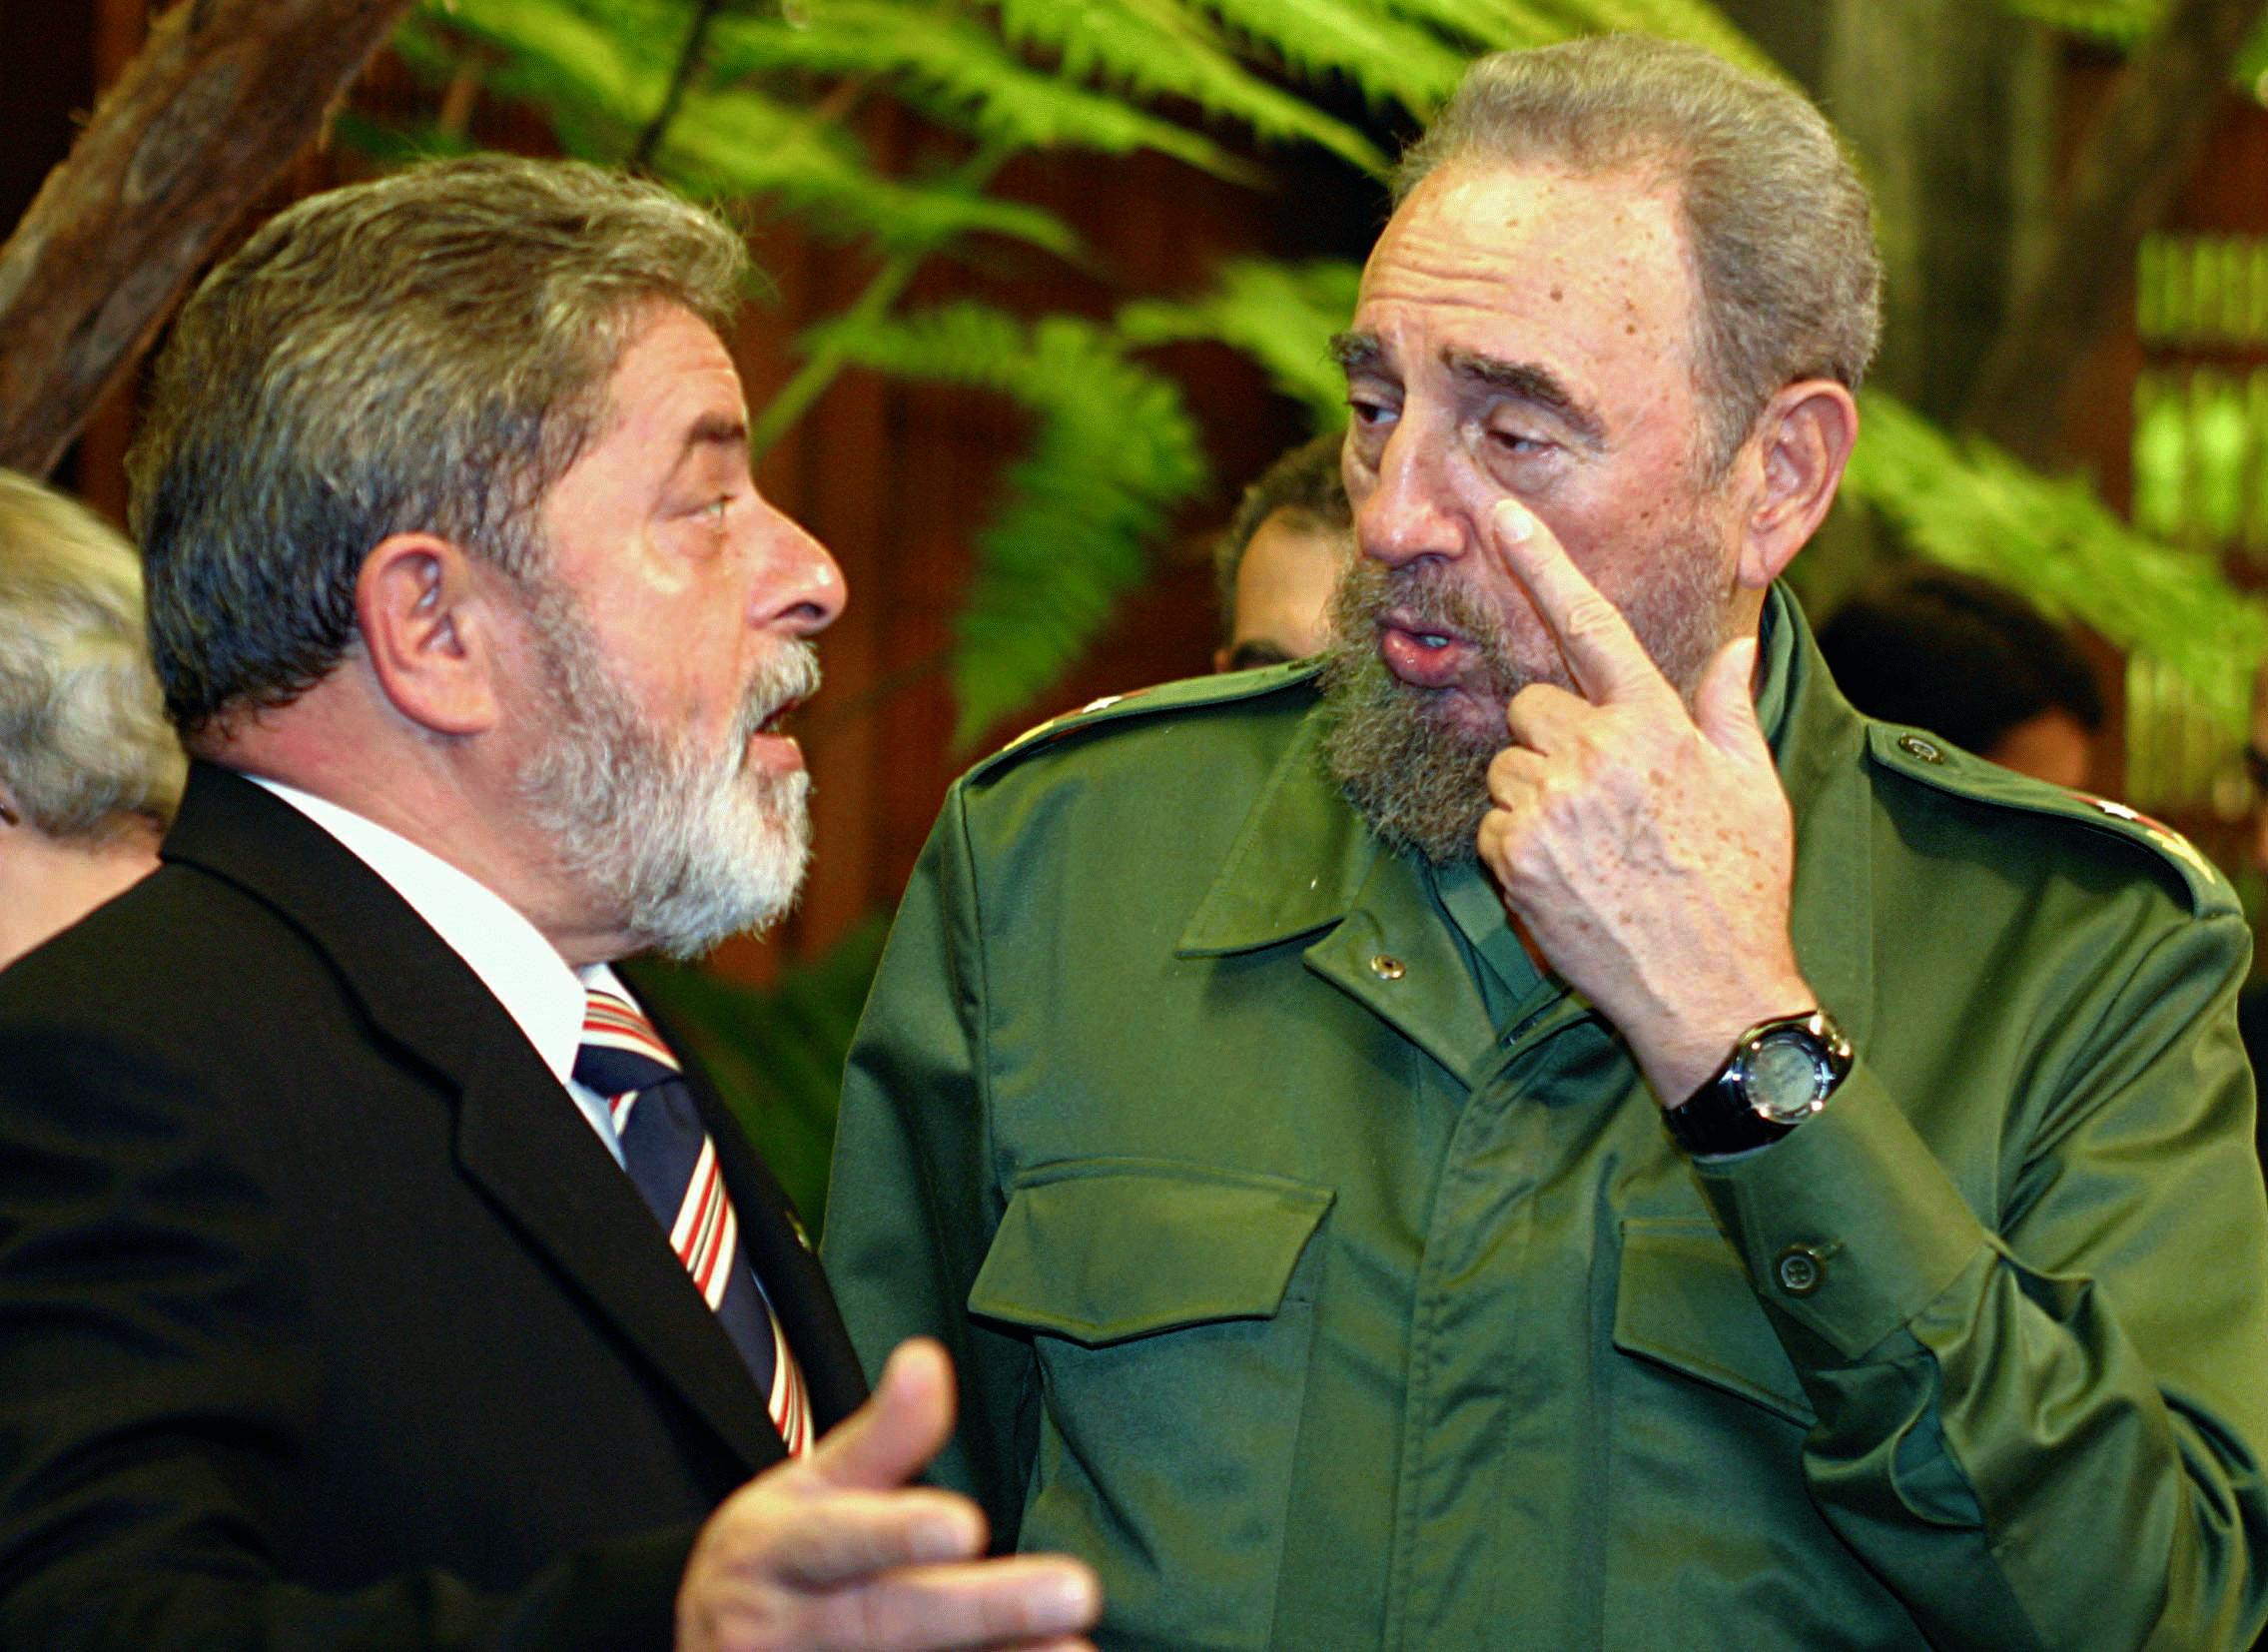 Fidel y el presidente brasileño Lula da Silva (a la izquierda).